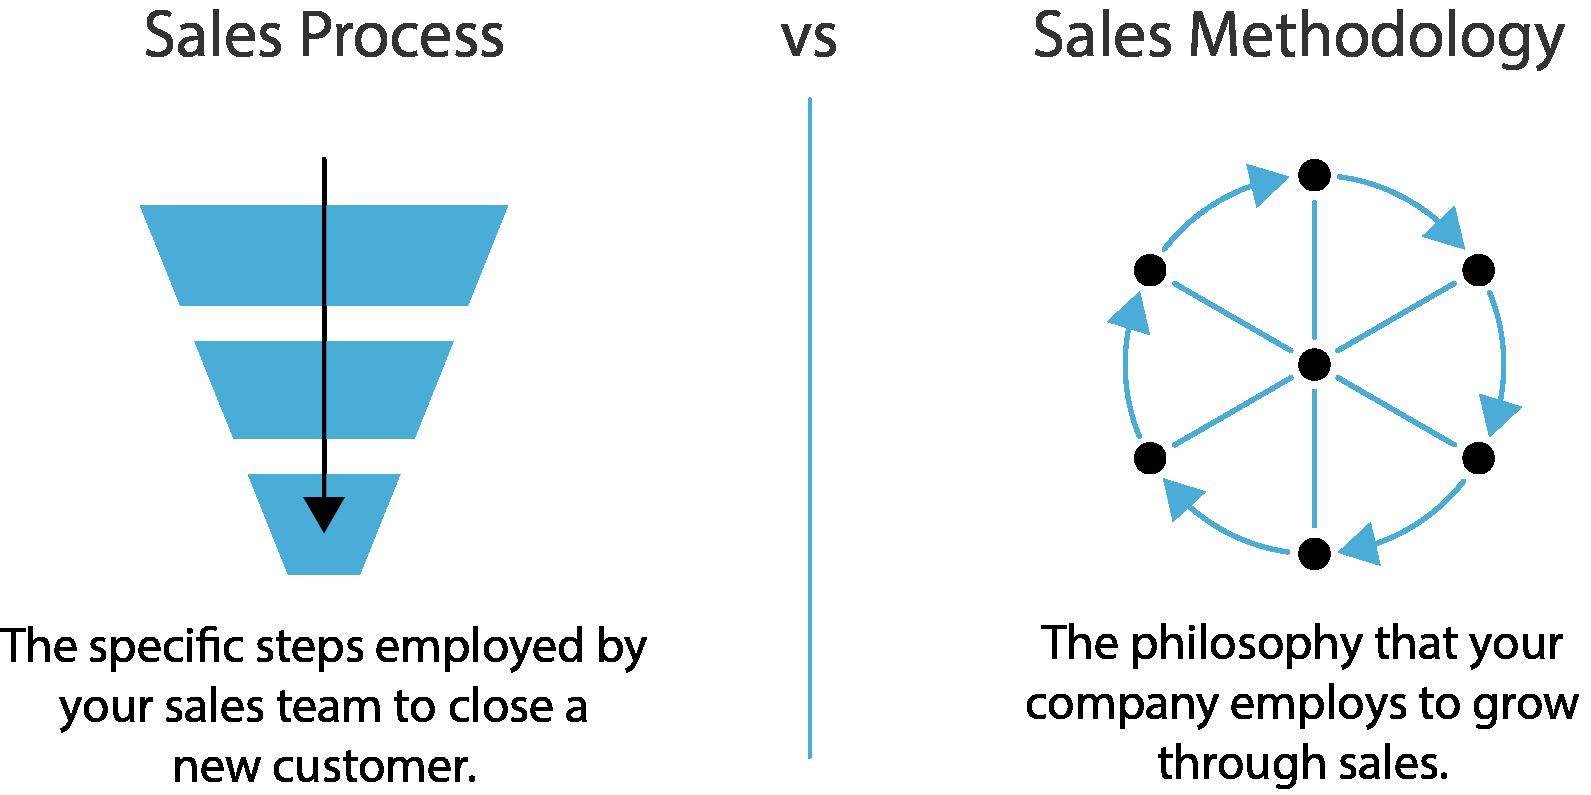 Sales Process vs Methodology